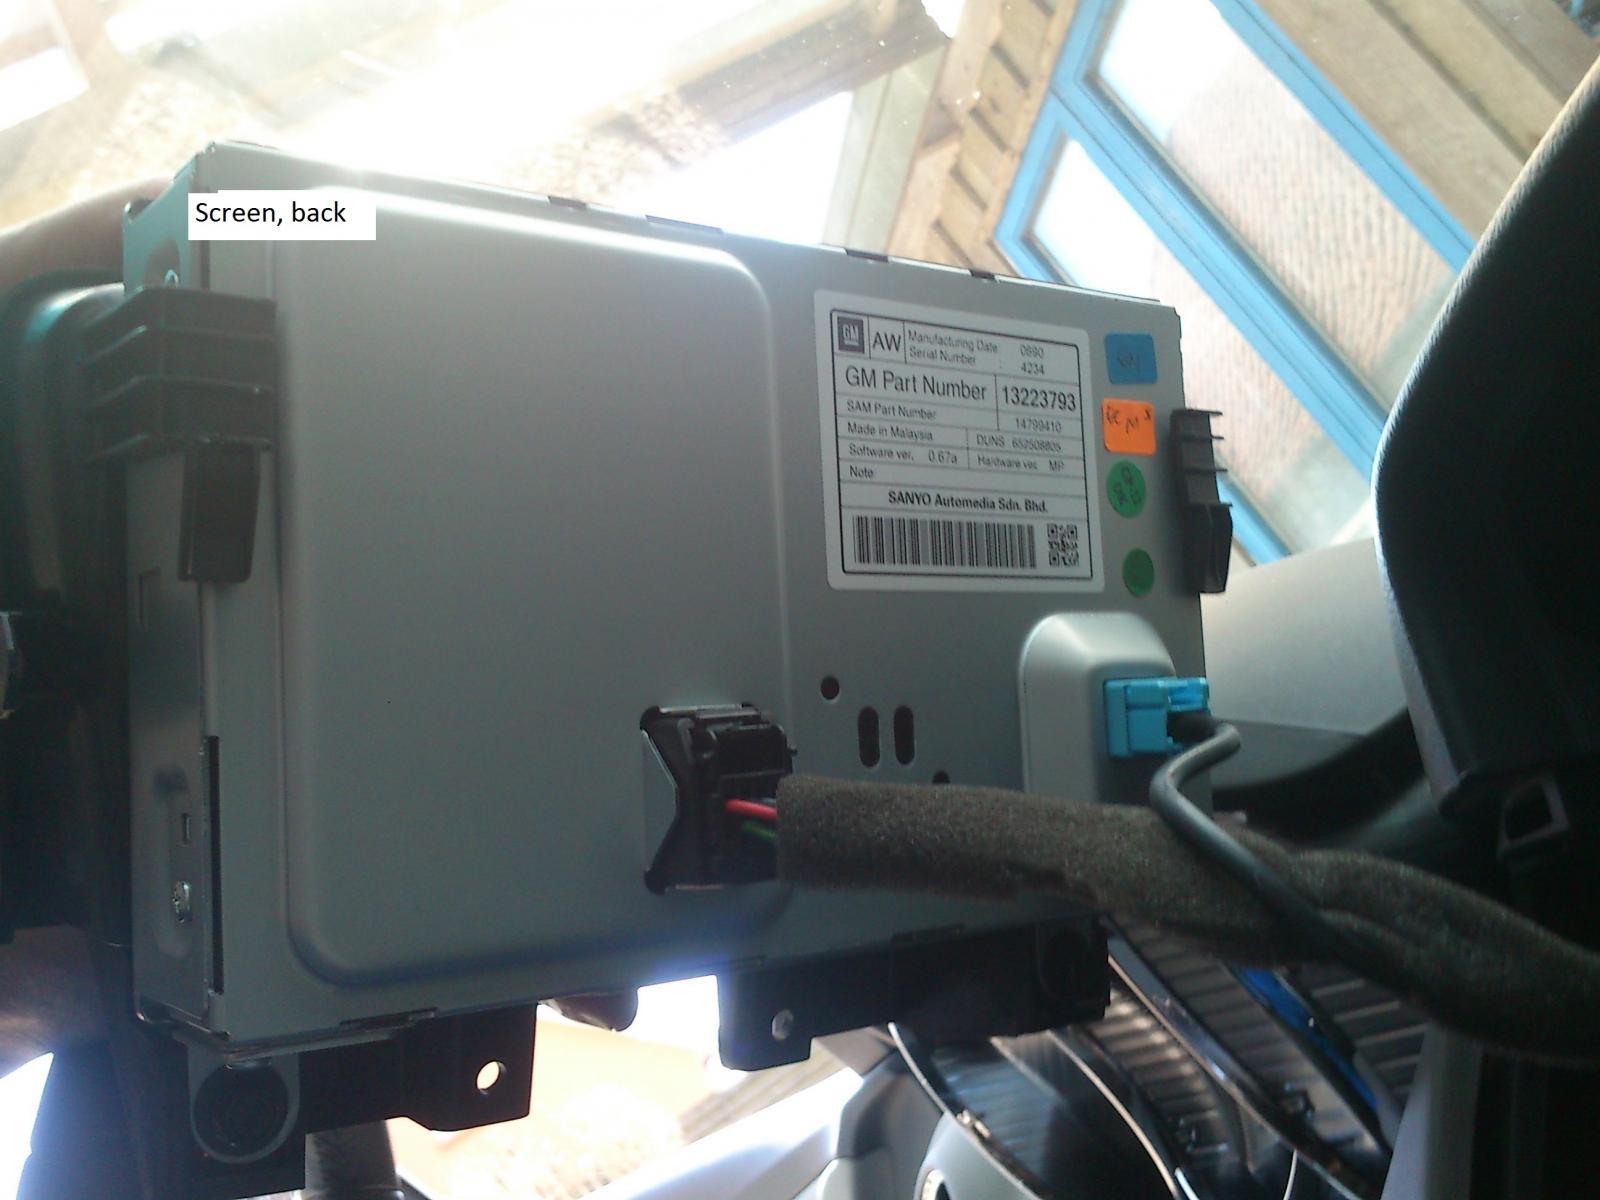 Backup Camera Installation Wiring Diagram Trusted Diagrams Pyle Plcm7700 Cruze Reverse Schematic Bc30